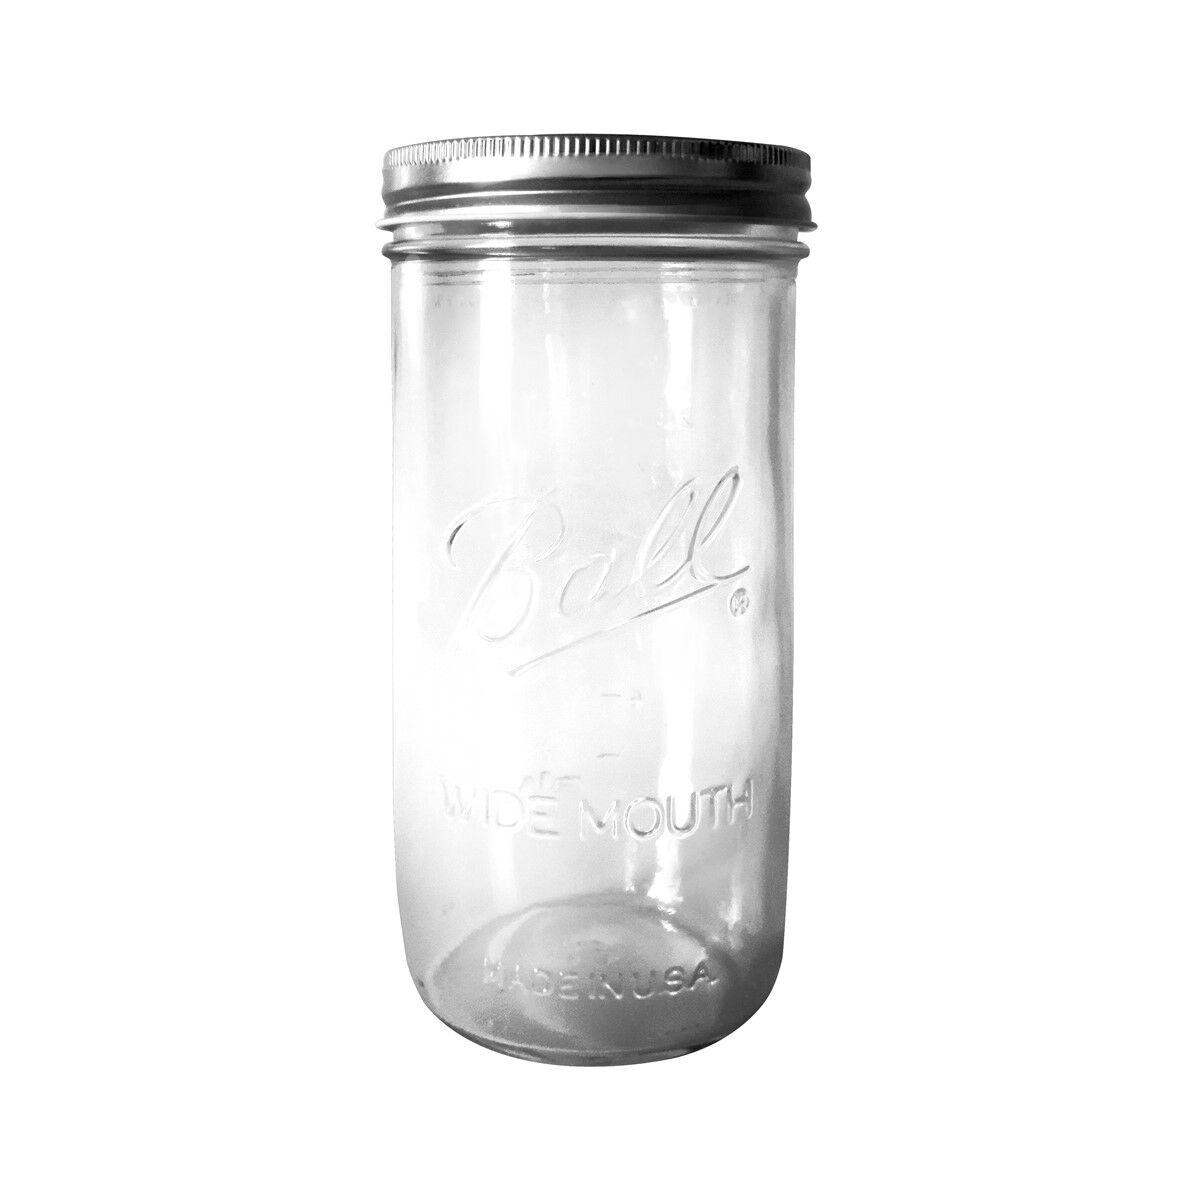 Fenel & Arno Lampe bocal en verre gris